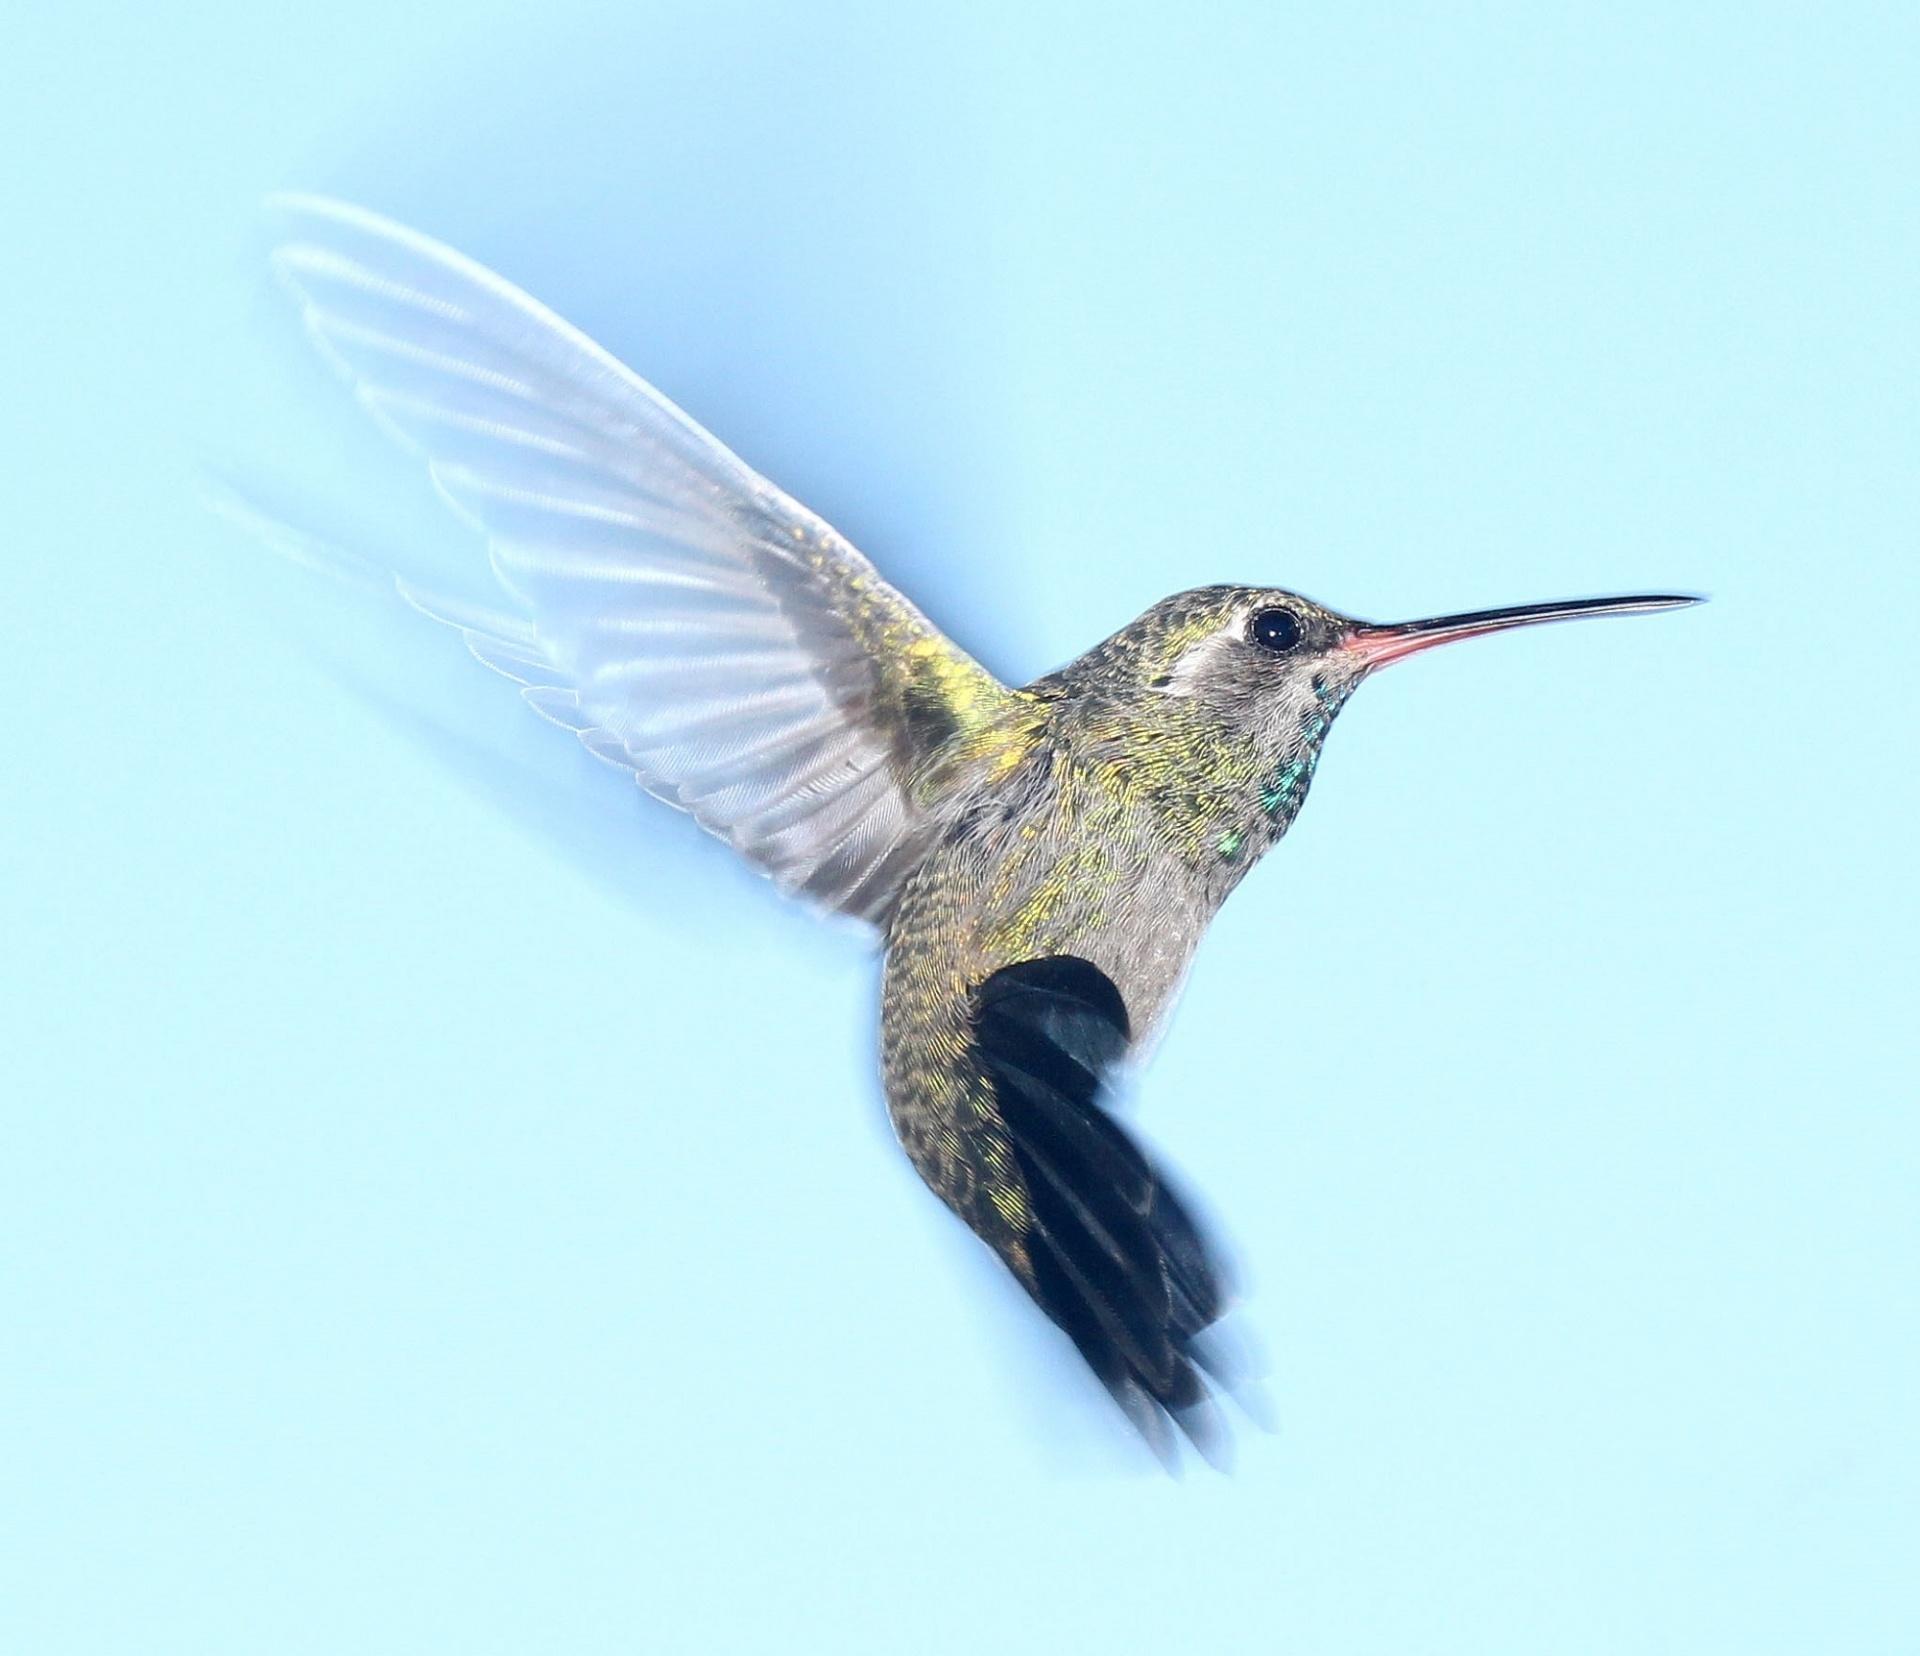 Wings Wallpaper Hd Hummingbird In Flight Free Stock Photo Public Domain